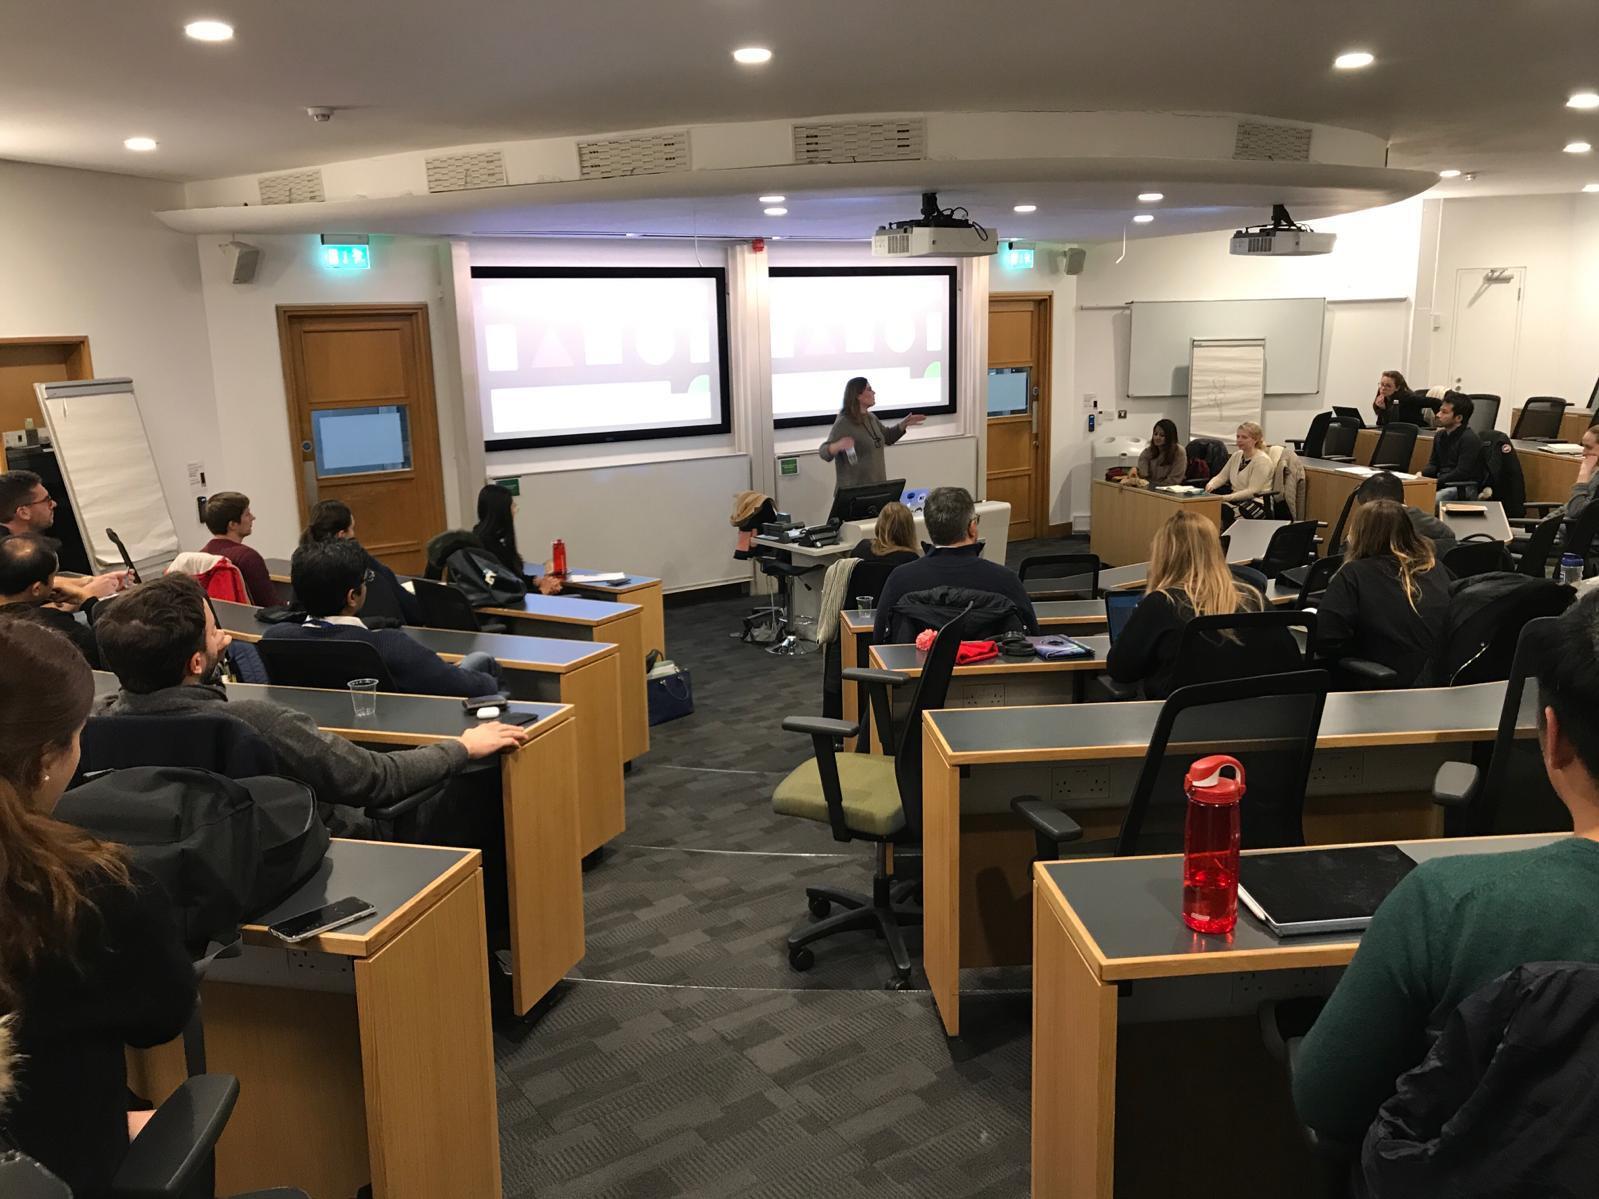 Industry Speaker at London Business School 'Design & Innovation Club' 2019.